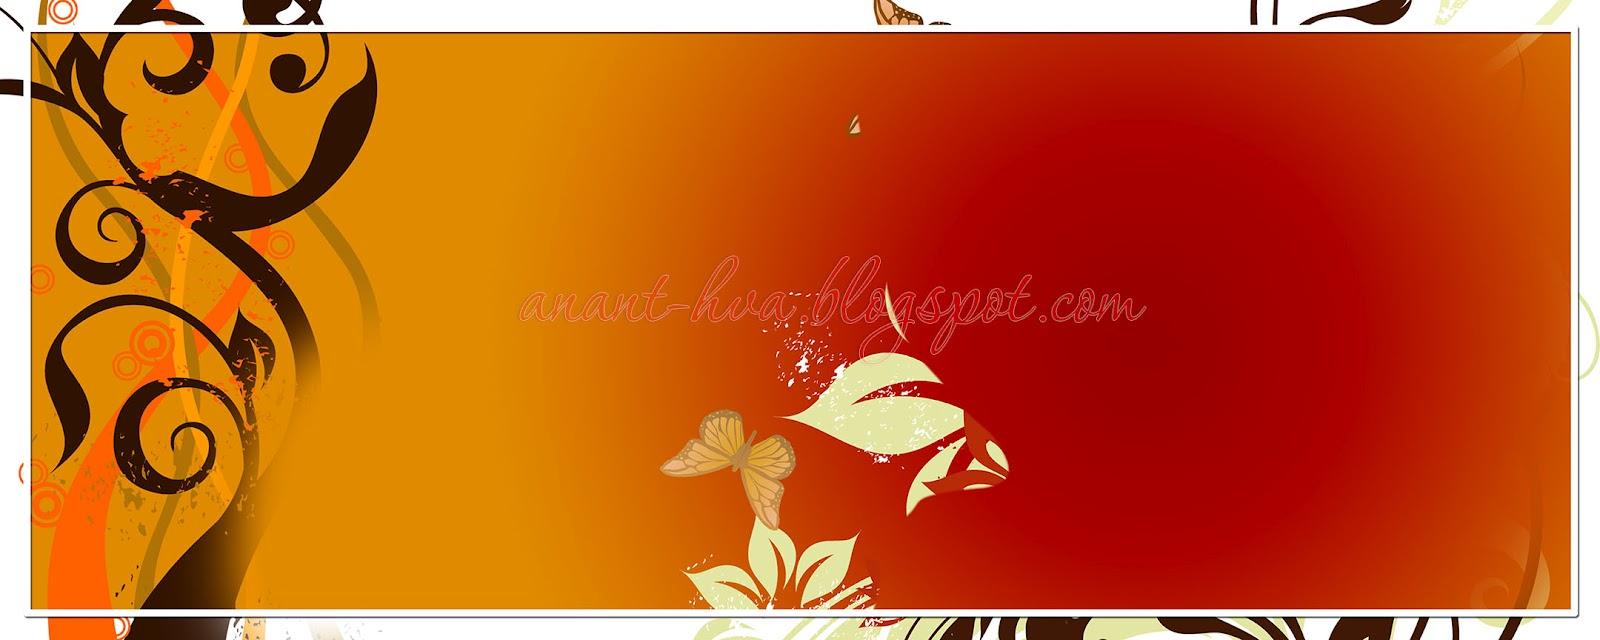 ... album background, Photo album, photoshop, templates, wedding album